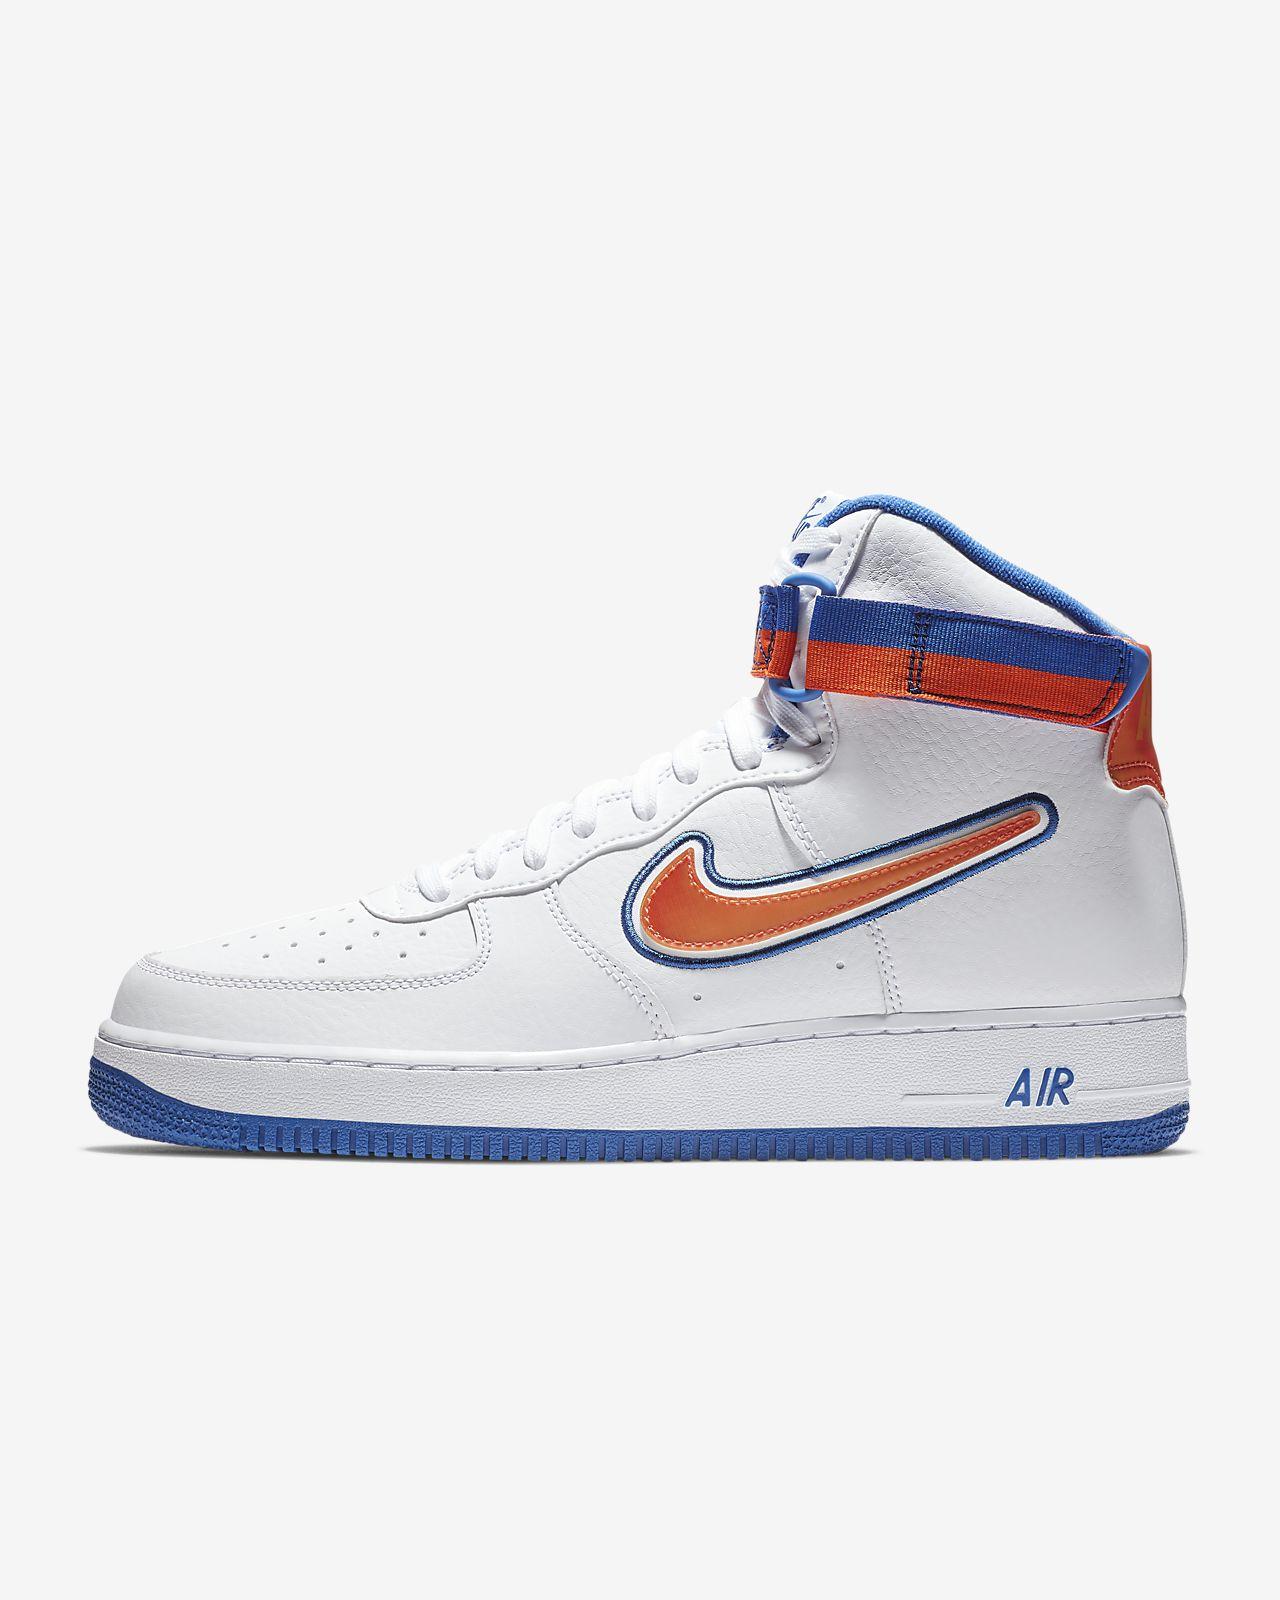 the best attitude 365d3 4d231 ... รองเท้าผู้ชาย Nike Air Force 1 NBA High (New York Knicks)